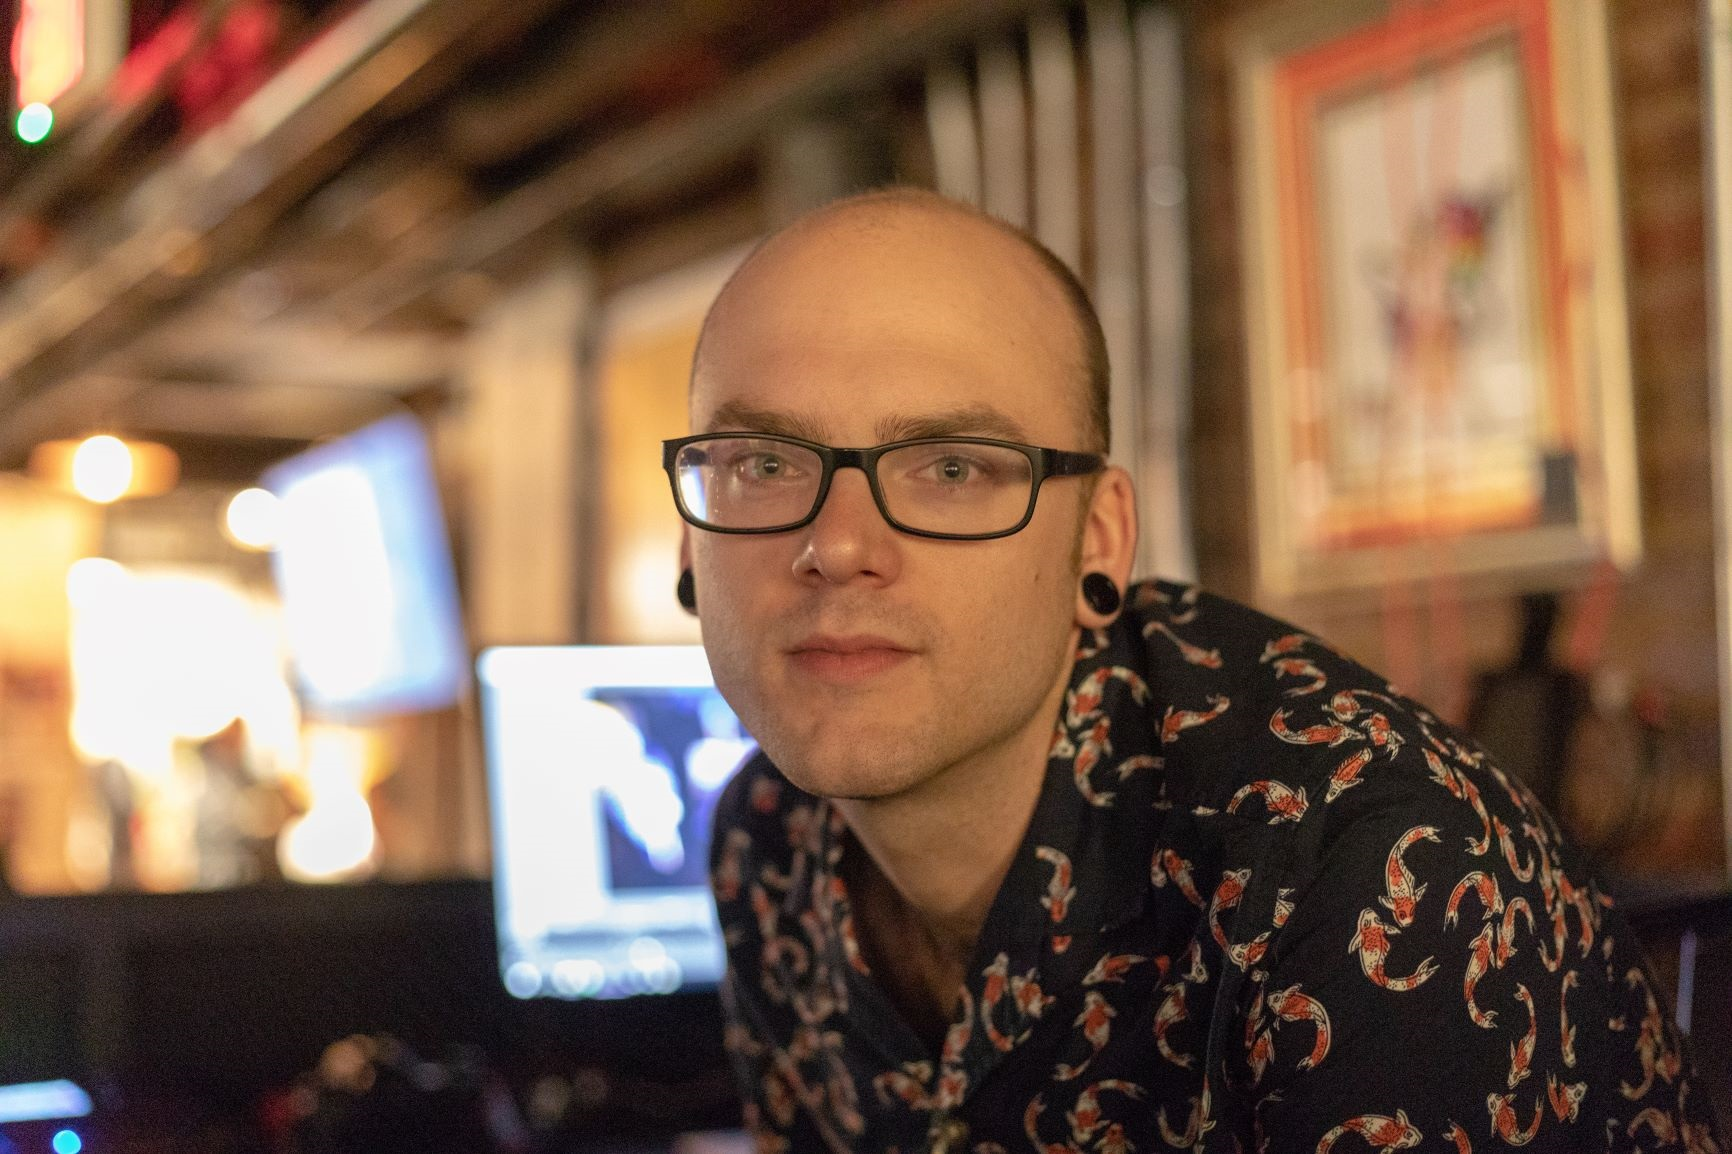 Eli Webb on the soundboard @ Art of Mind